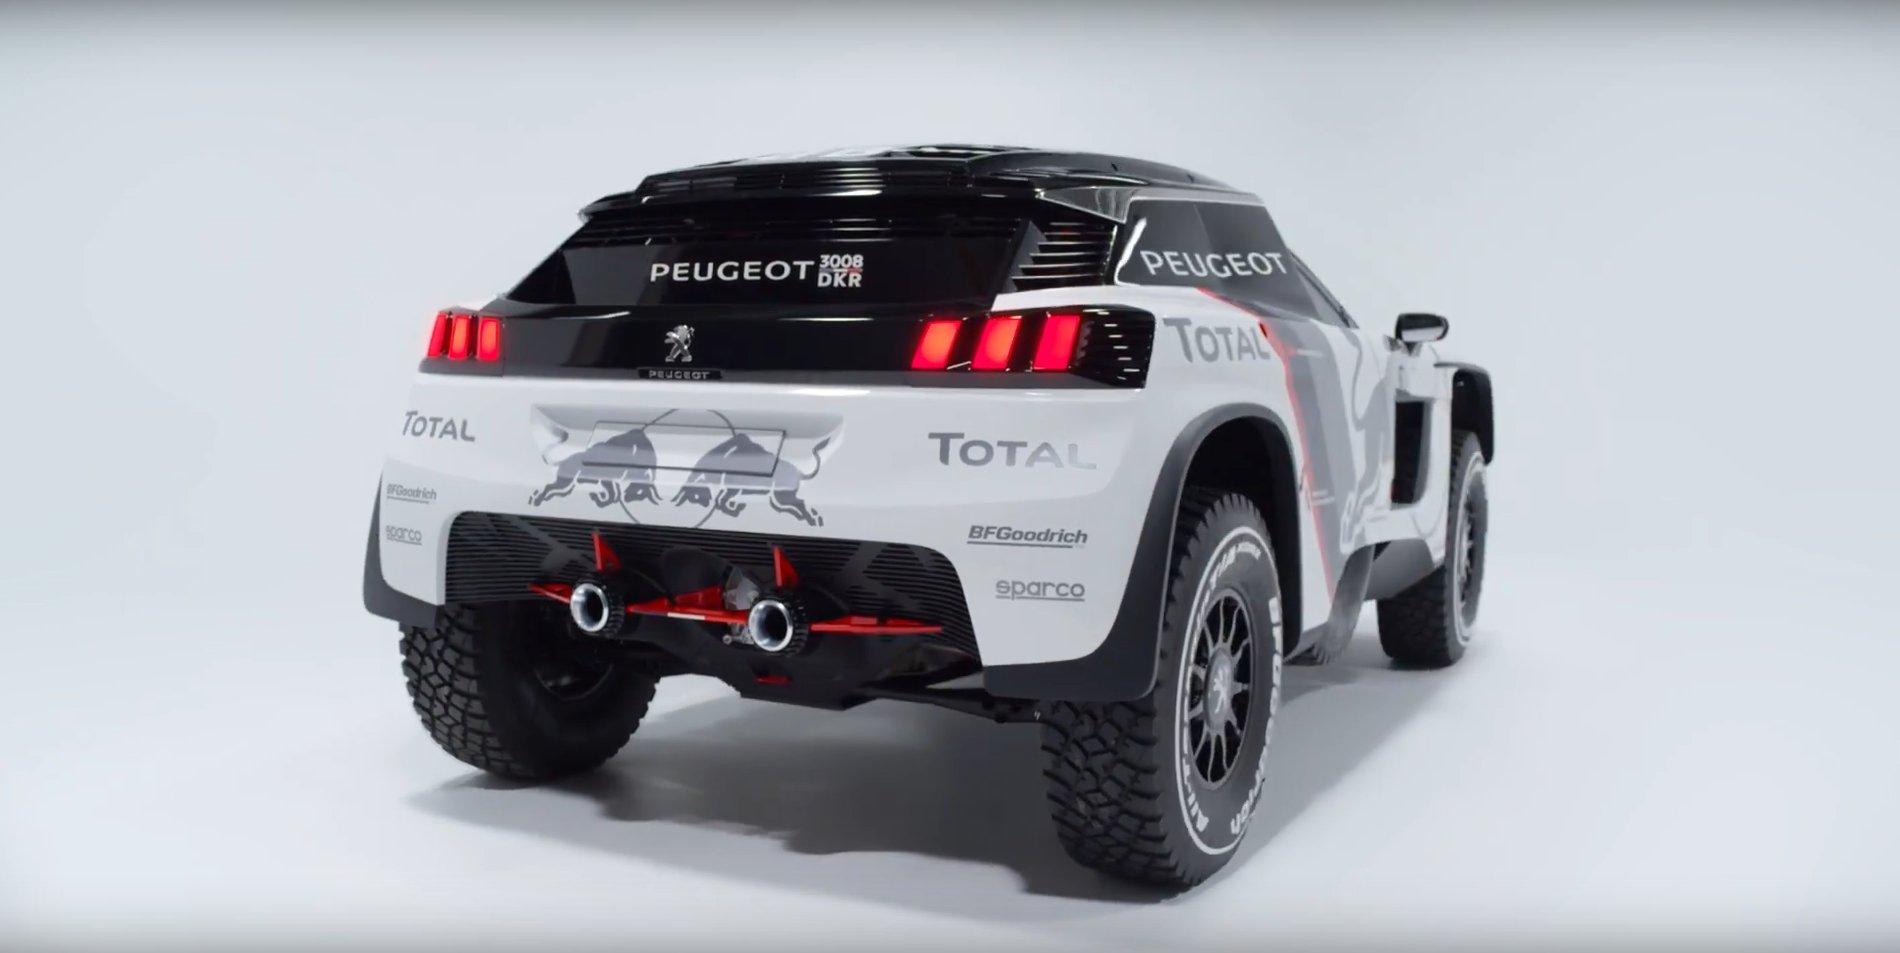 2016 Rallye Raid Dakar Argentina - Bolivia [3-16 Enero] - Página 11 CsK5lyKWYAAtqT5